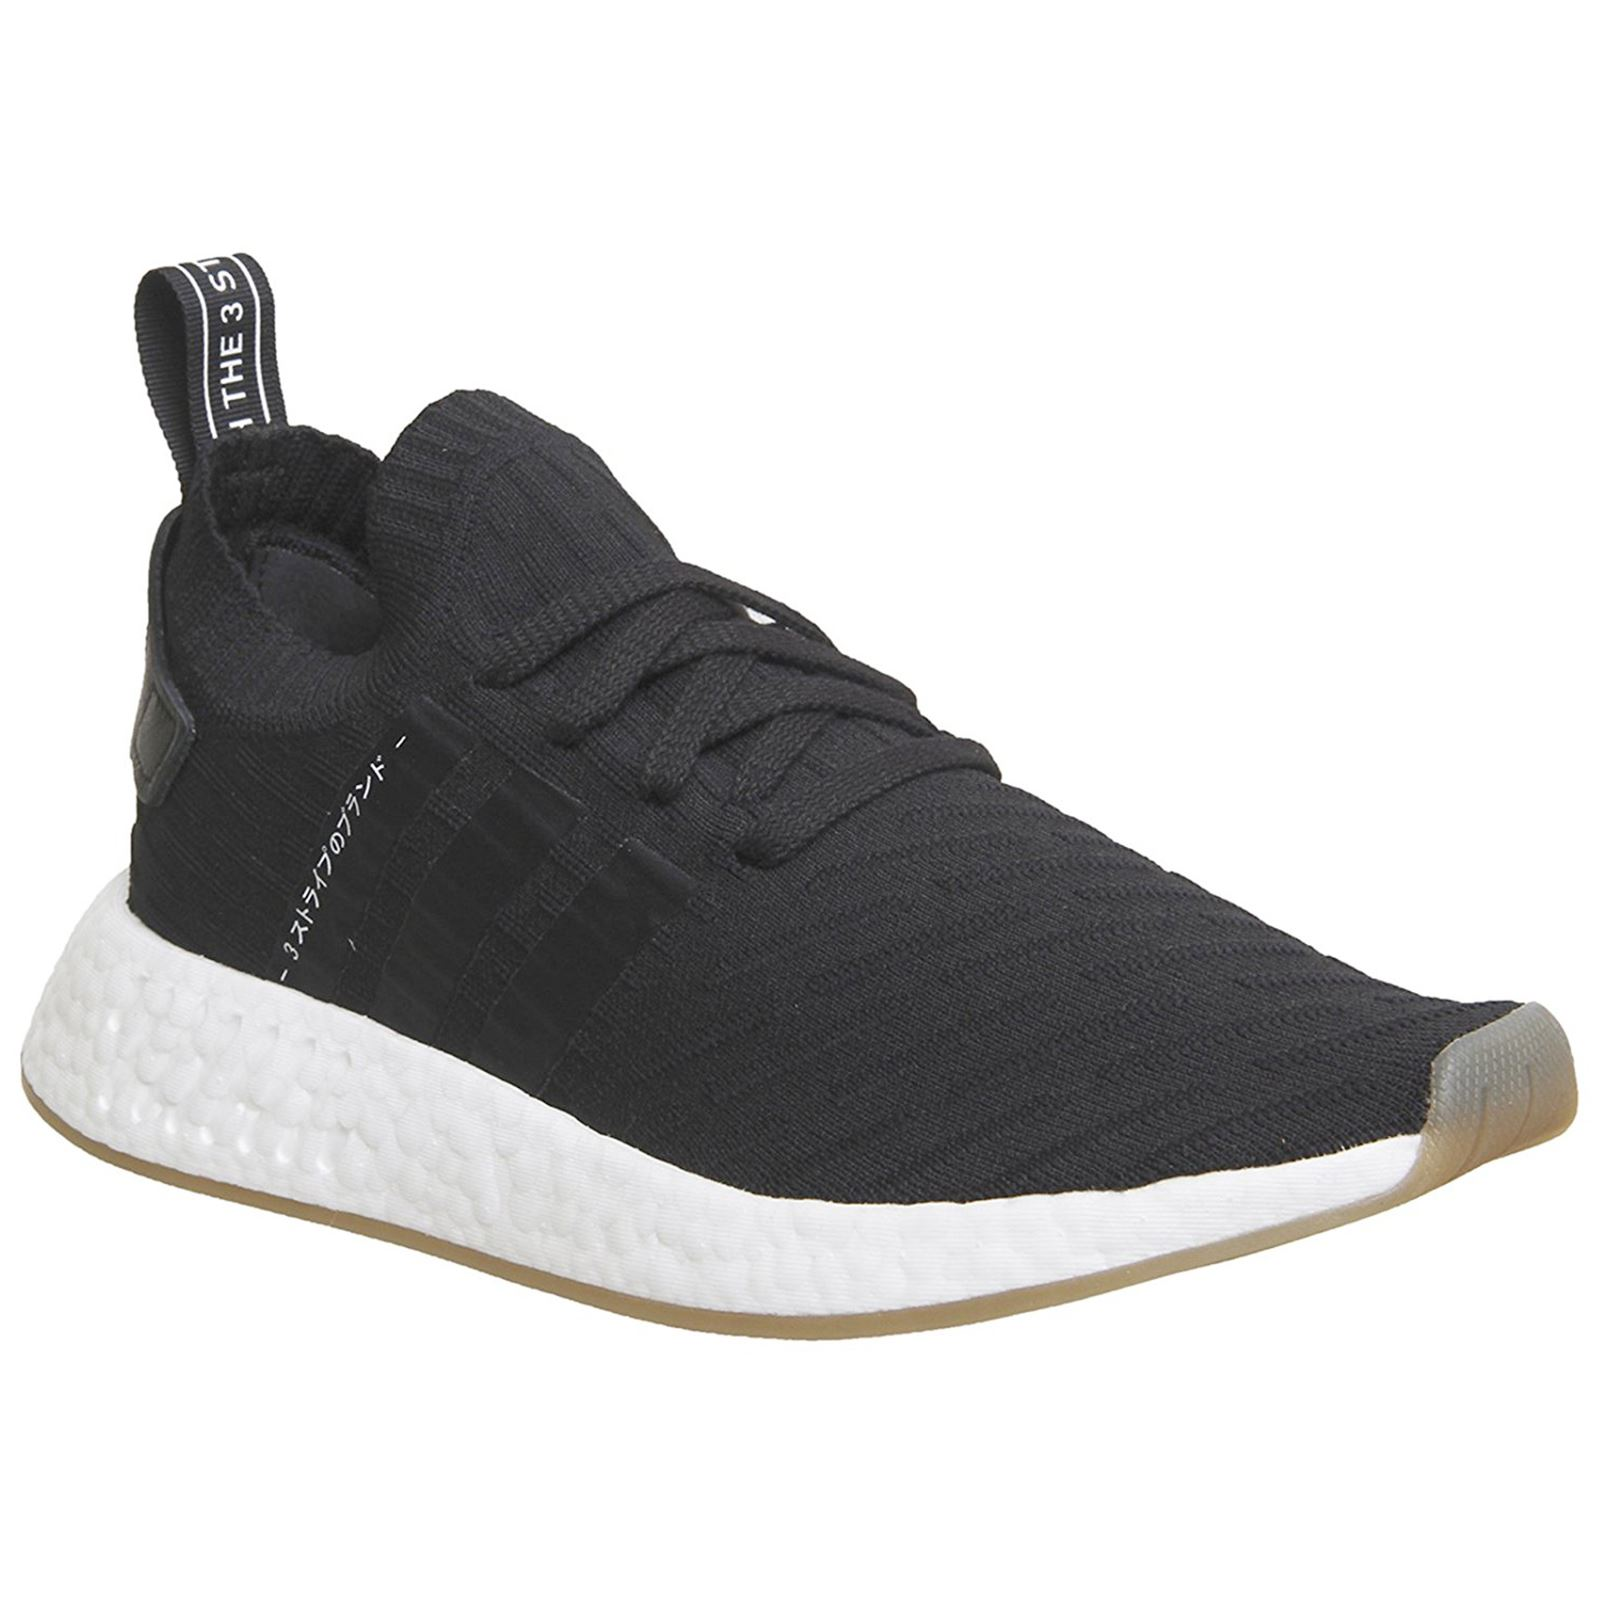 adidas nmd r2 primeknit bianco nero mens scarpe impulso tecnologico